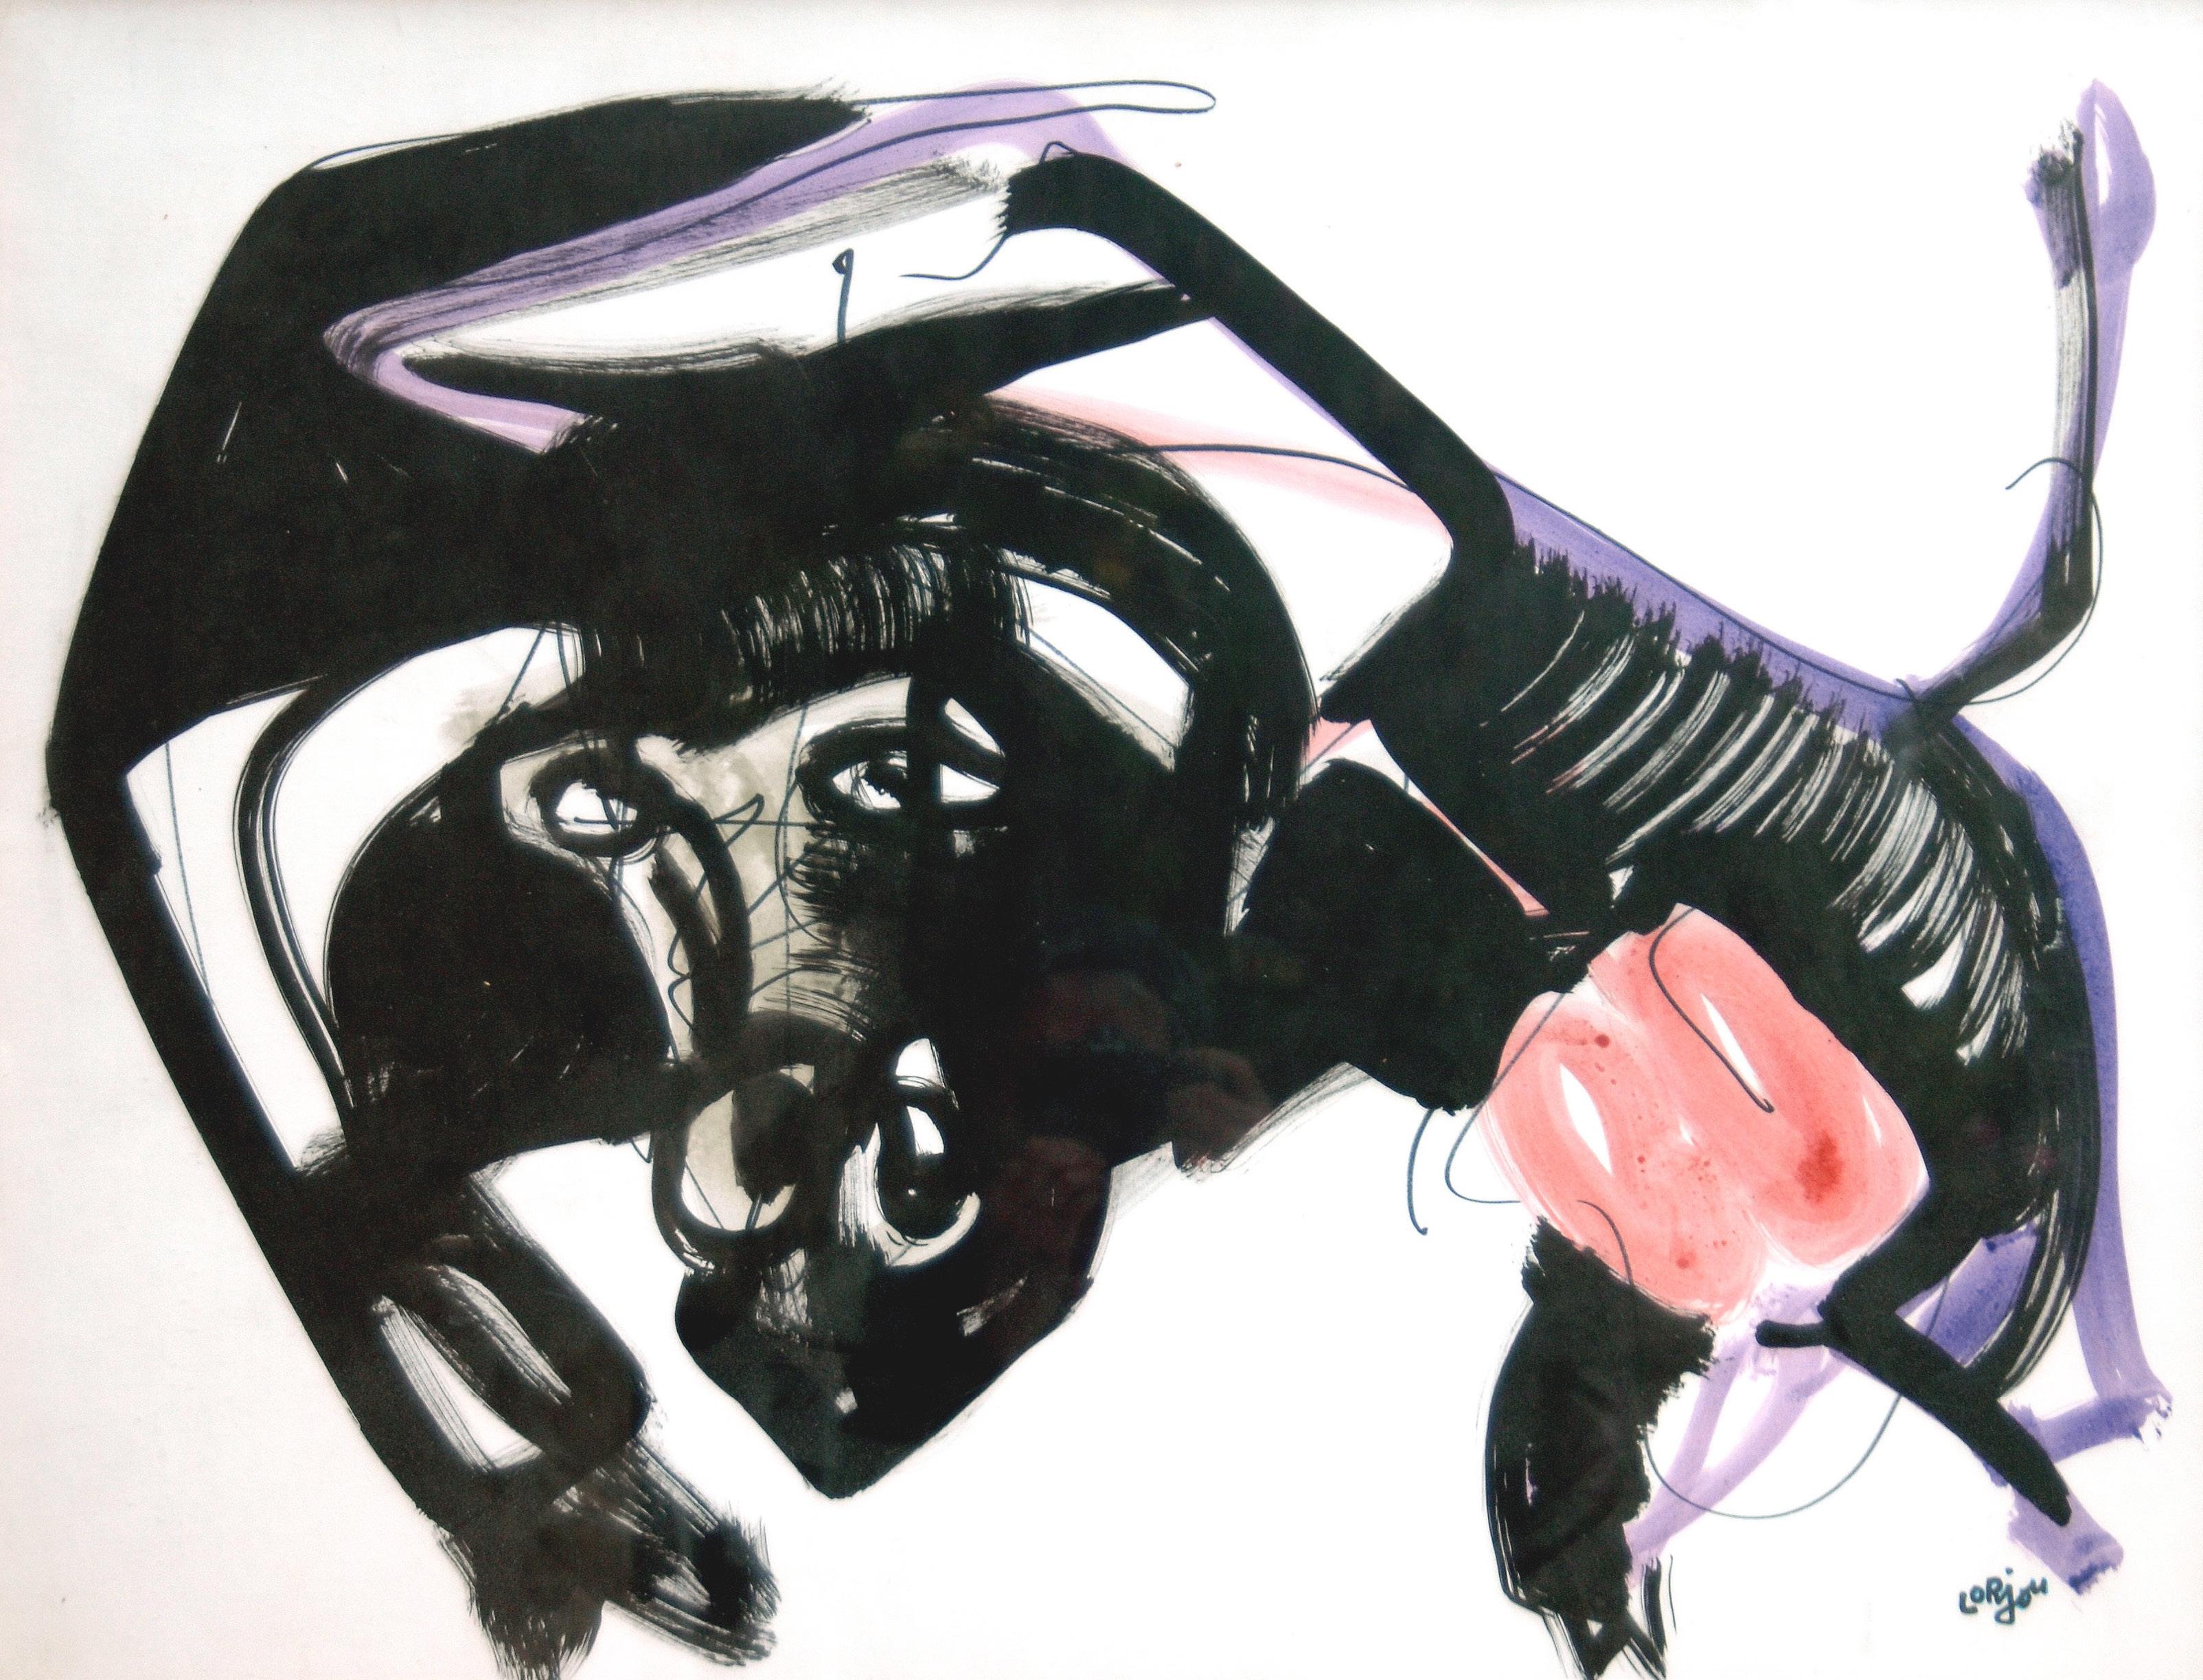 Langeais - Lorjoi l_Instinct  animal _Page_23.jpg